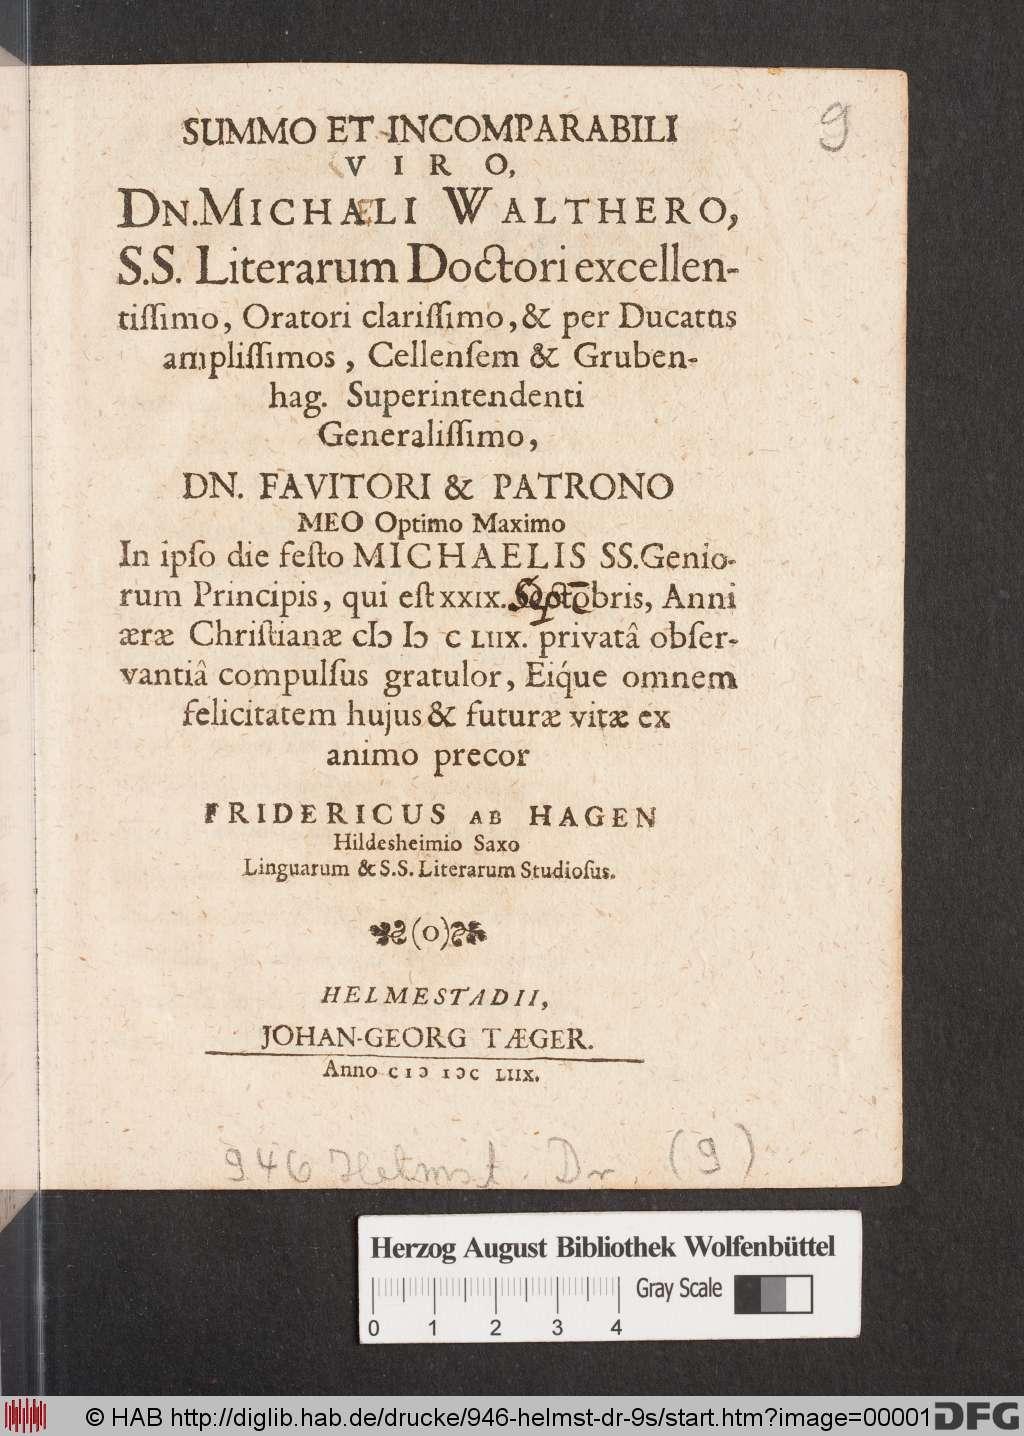 http://diglib.hab.de/drucke/946-helmst-dr-9s/00001.jpg